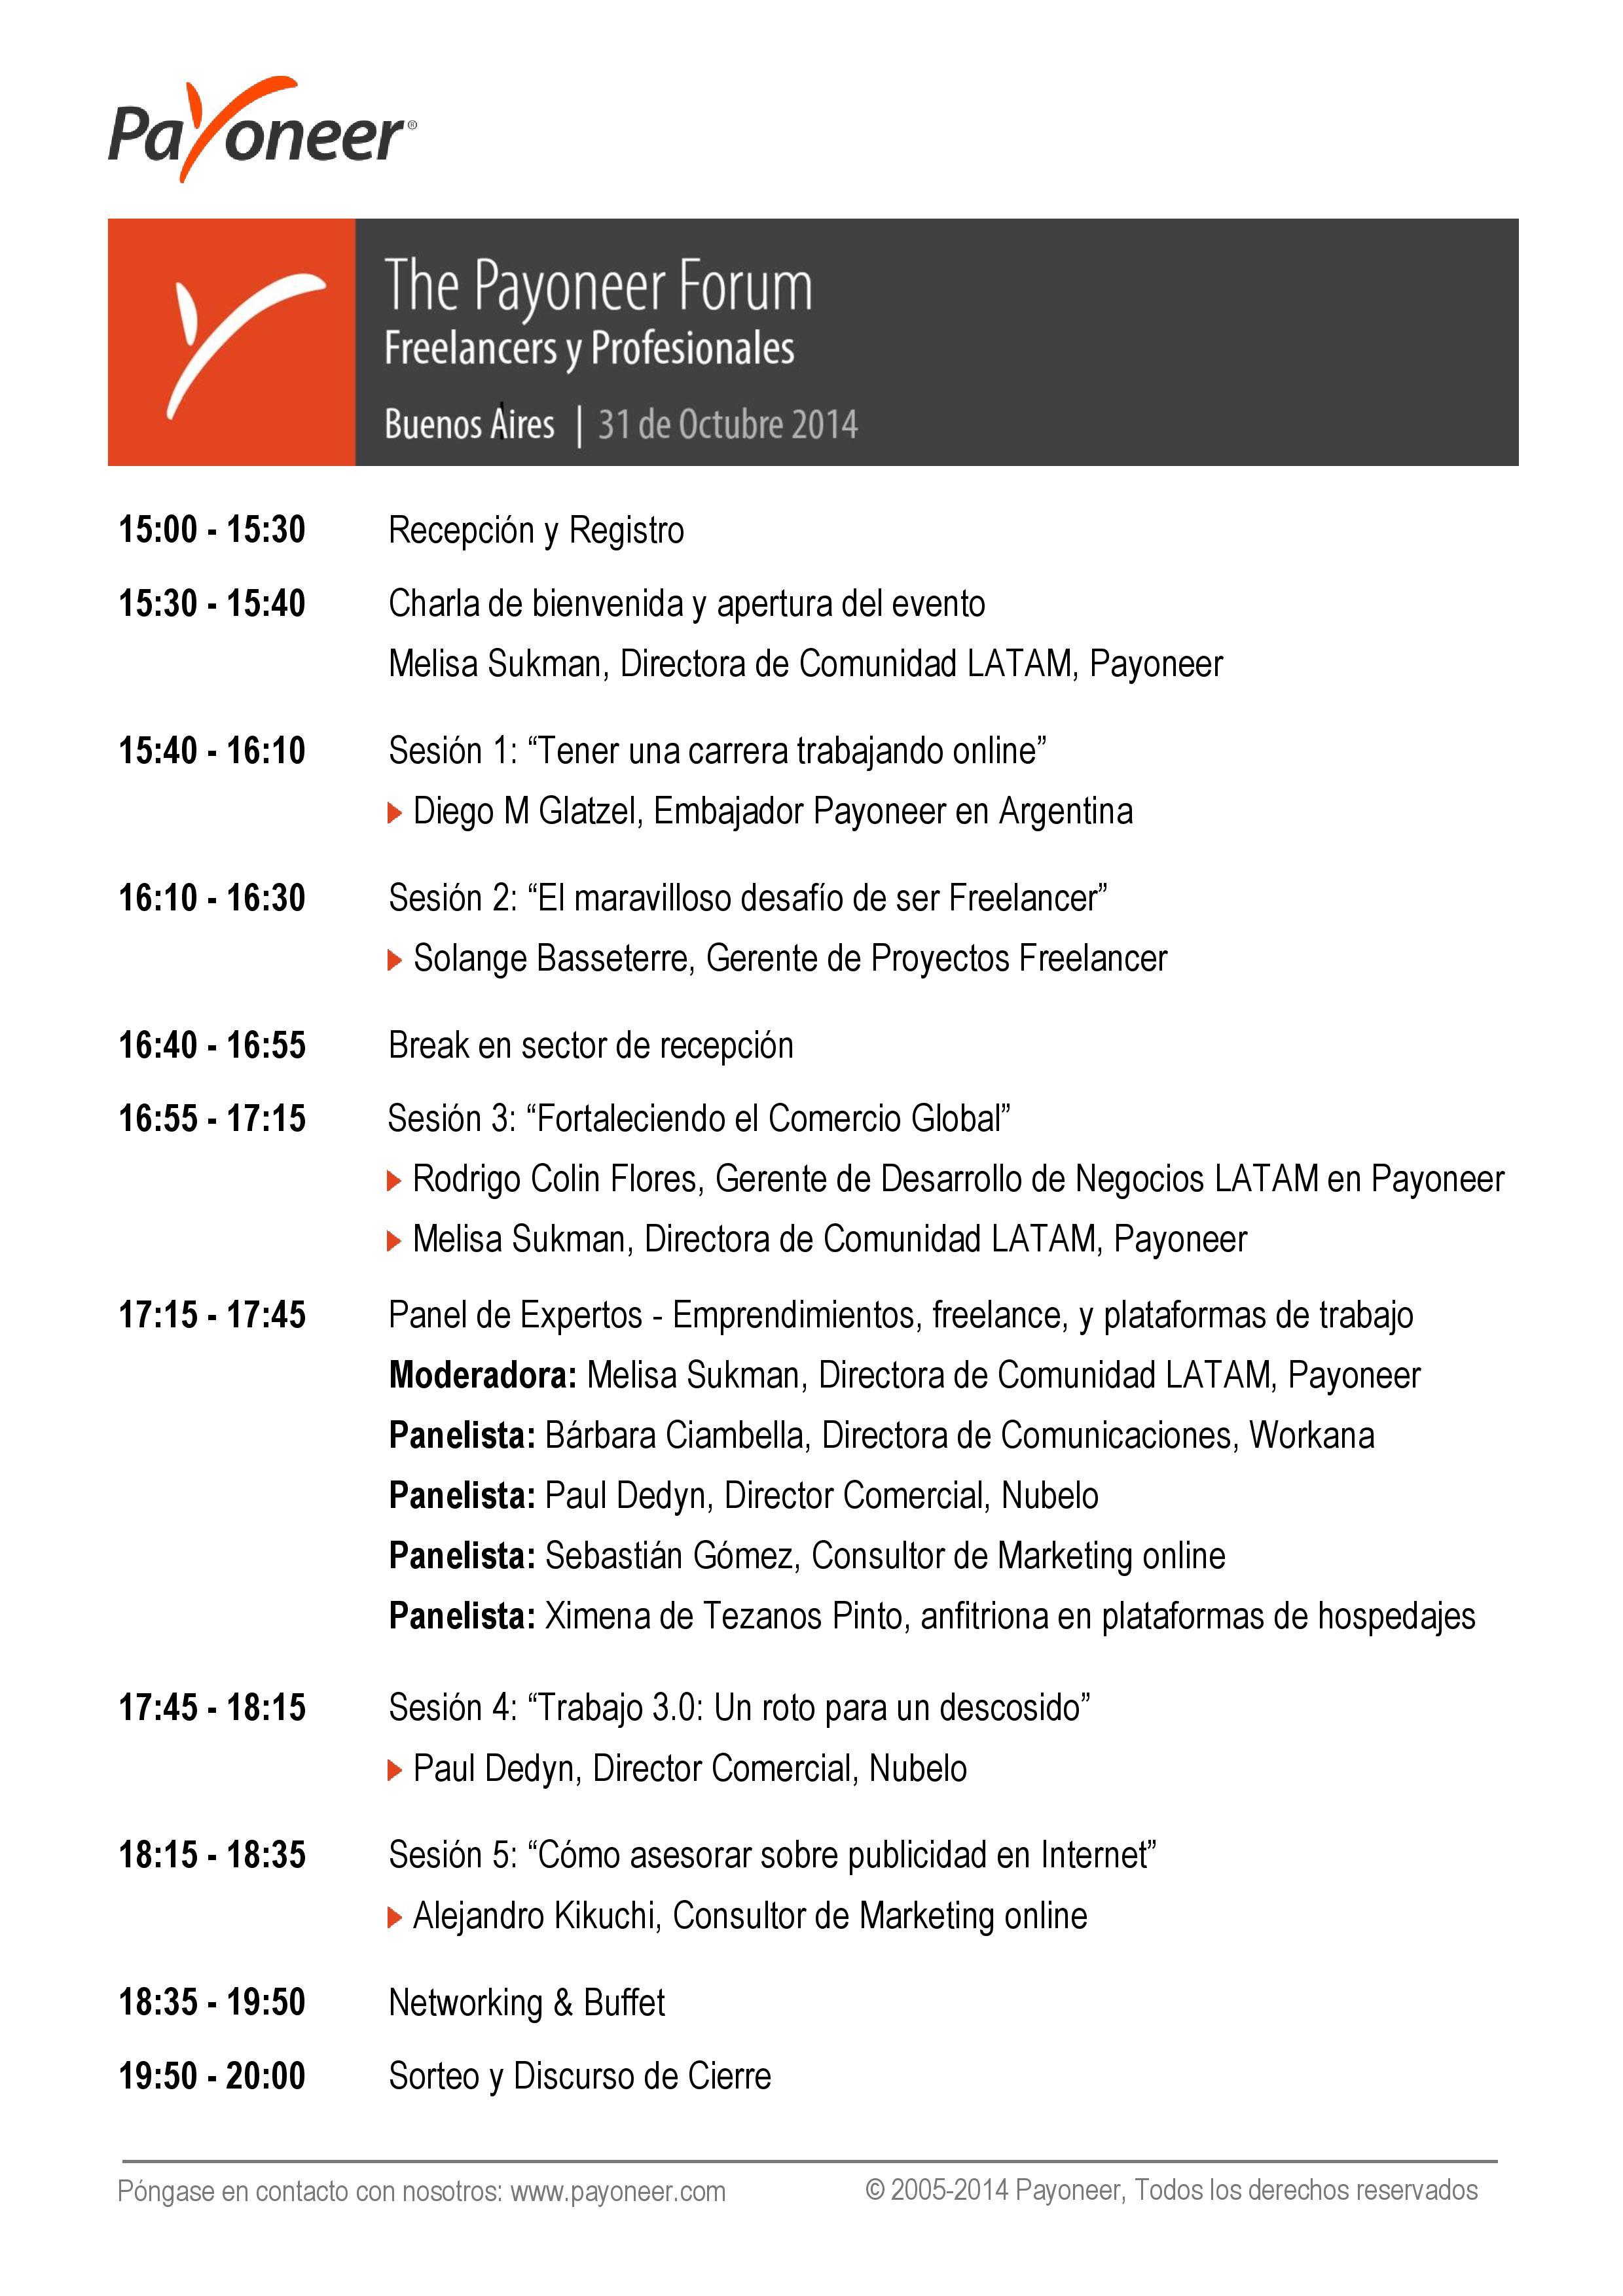 Payoneer Forum Buenos Aires